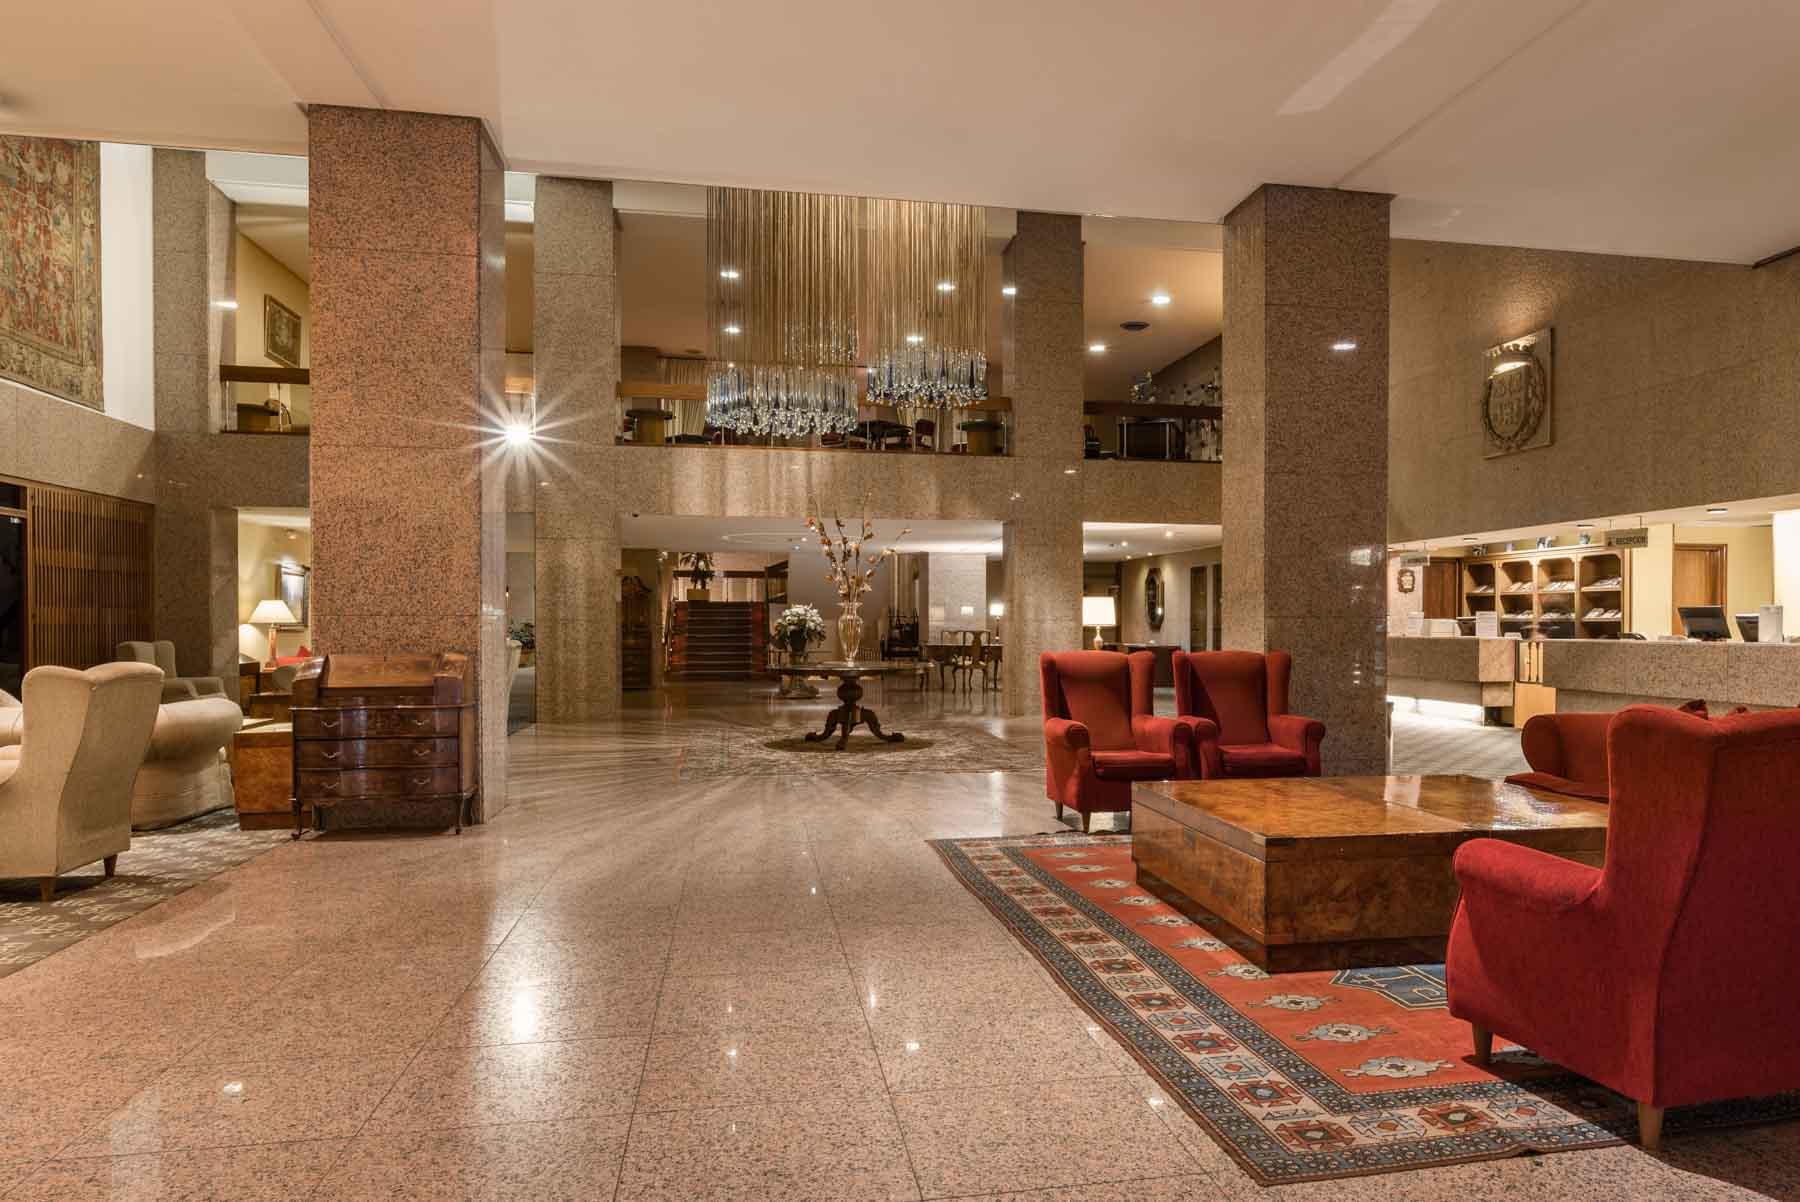 Gran Hotel Lugo